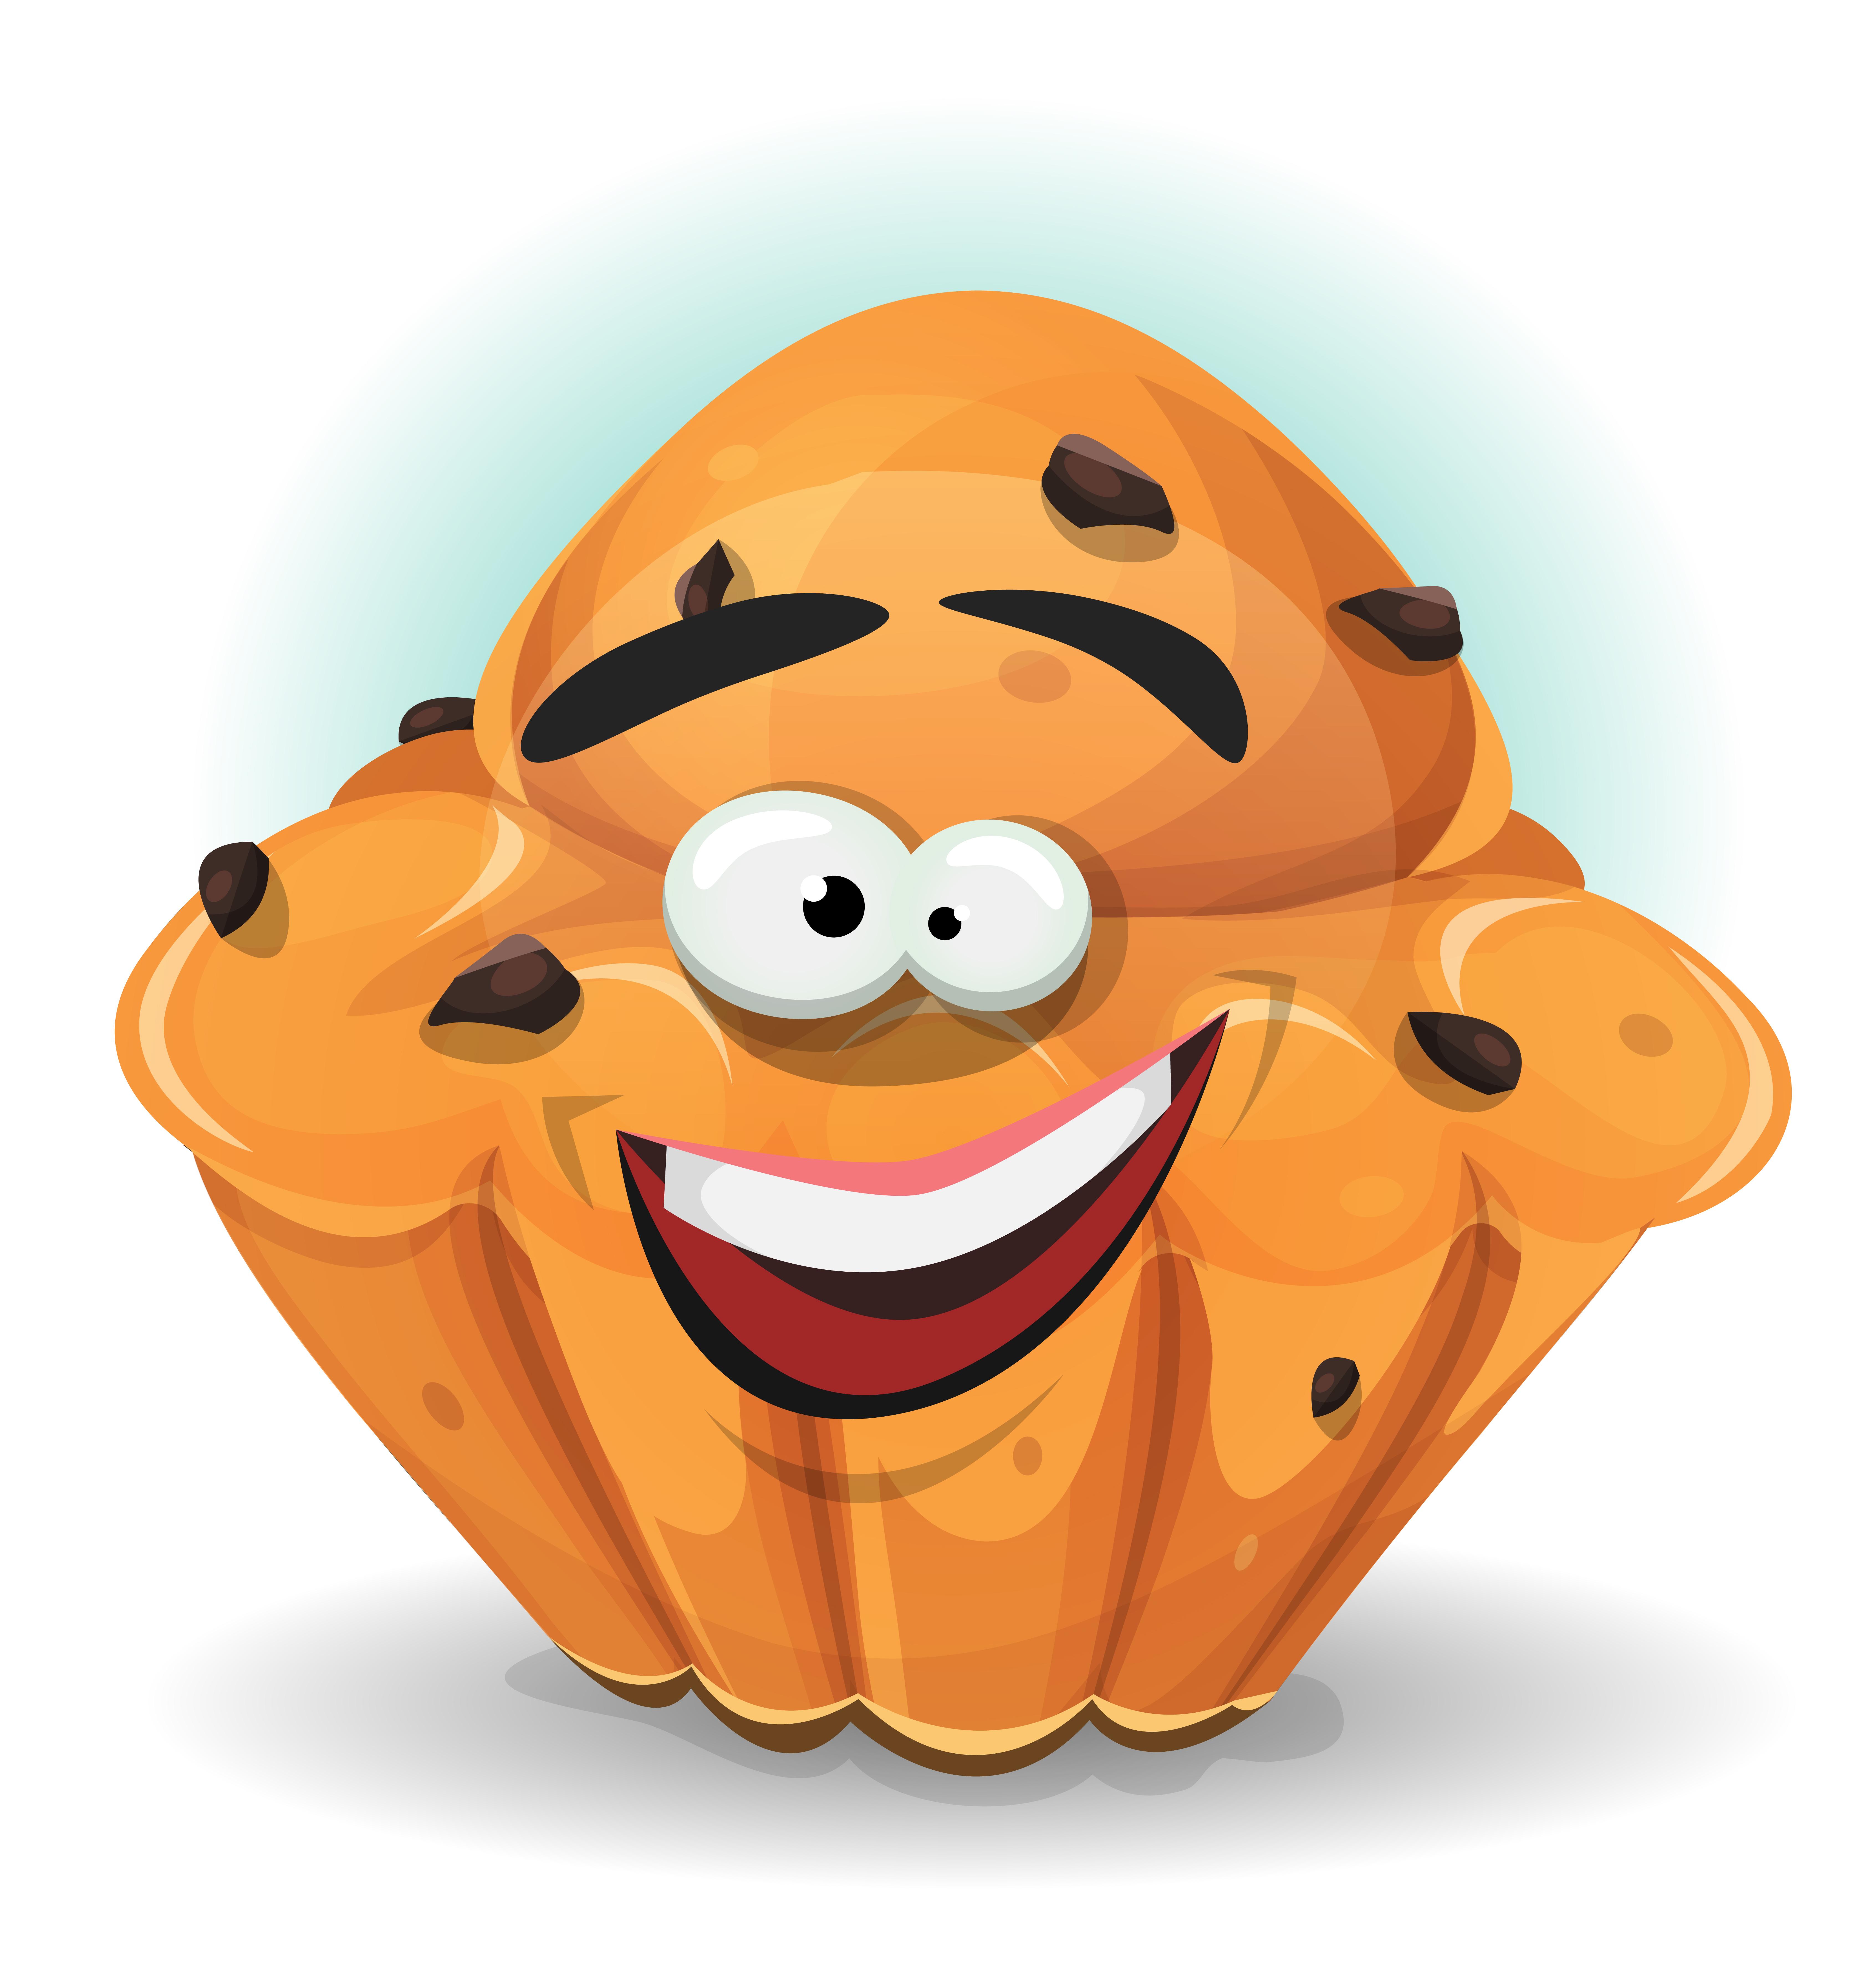 Cartoon Cake Character Download Free Vector Art Stock